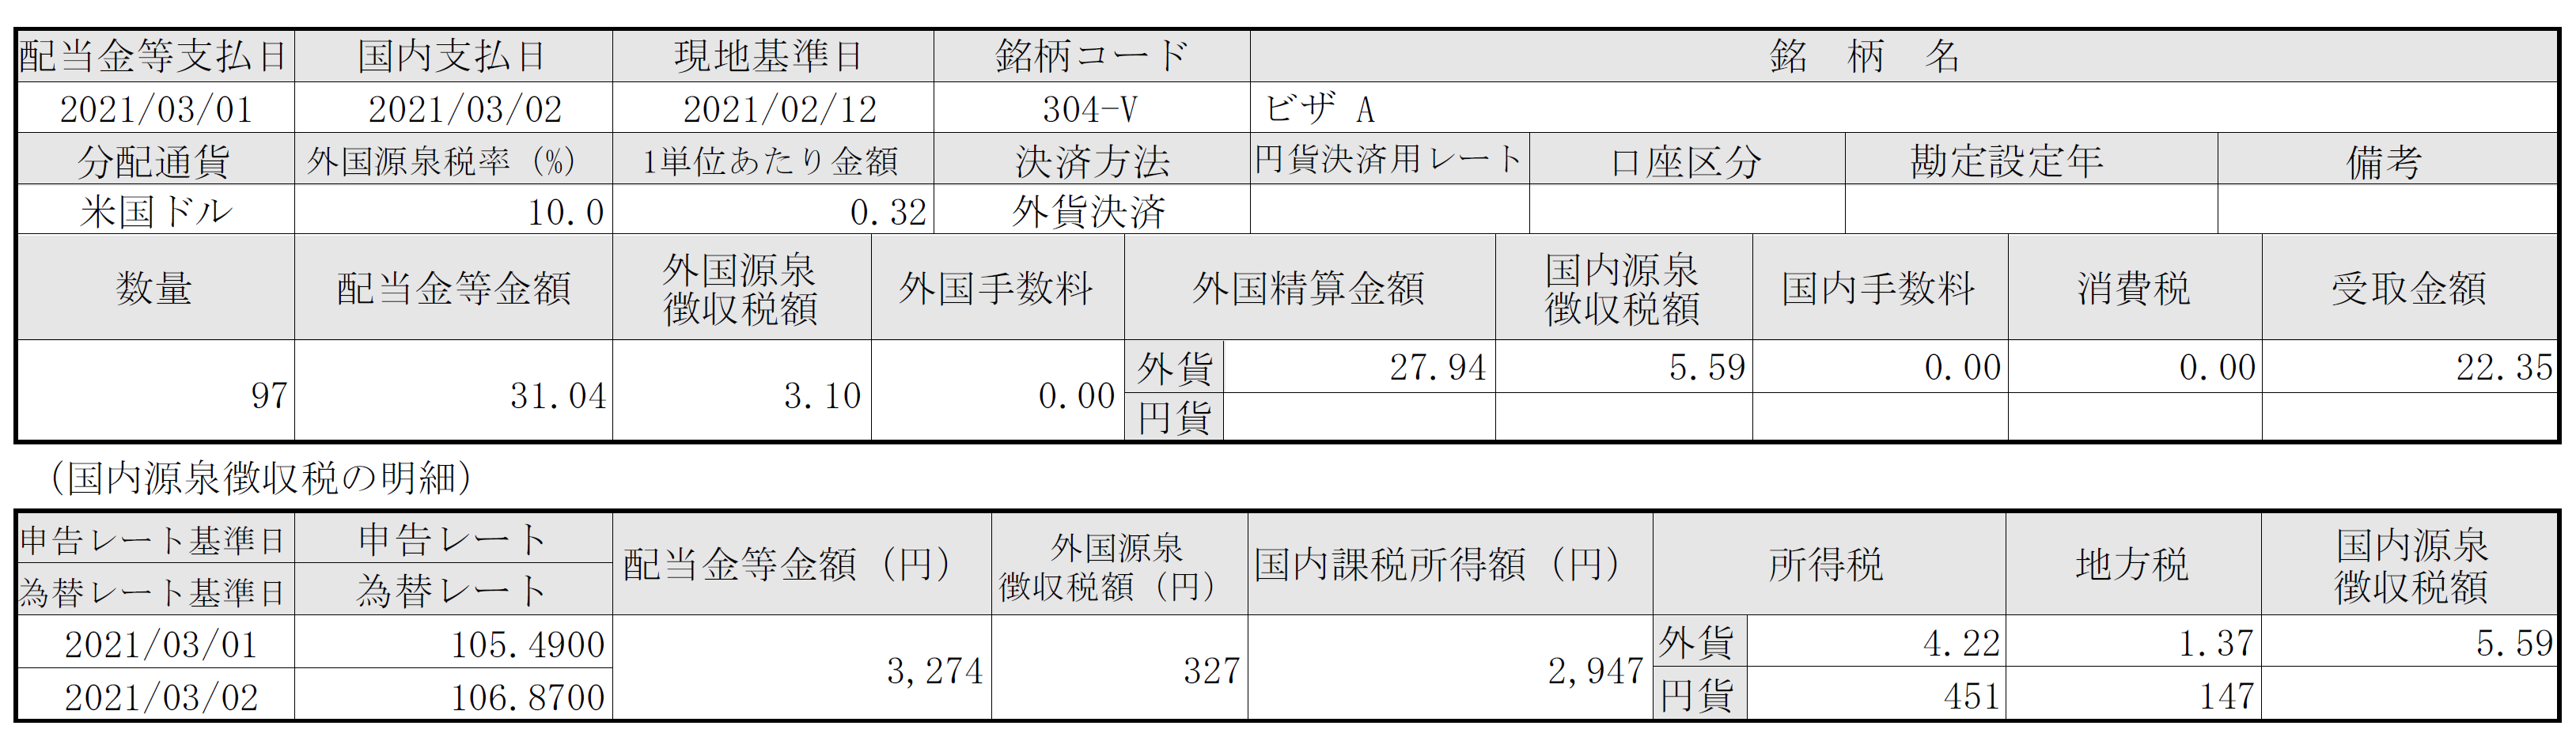 f:id:hodo-work:20210308192837p:plain